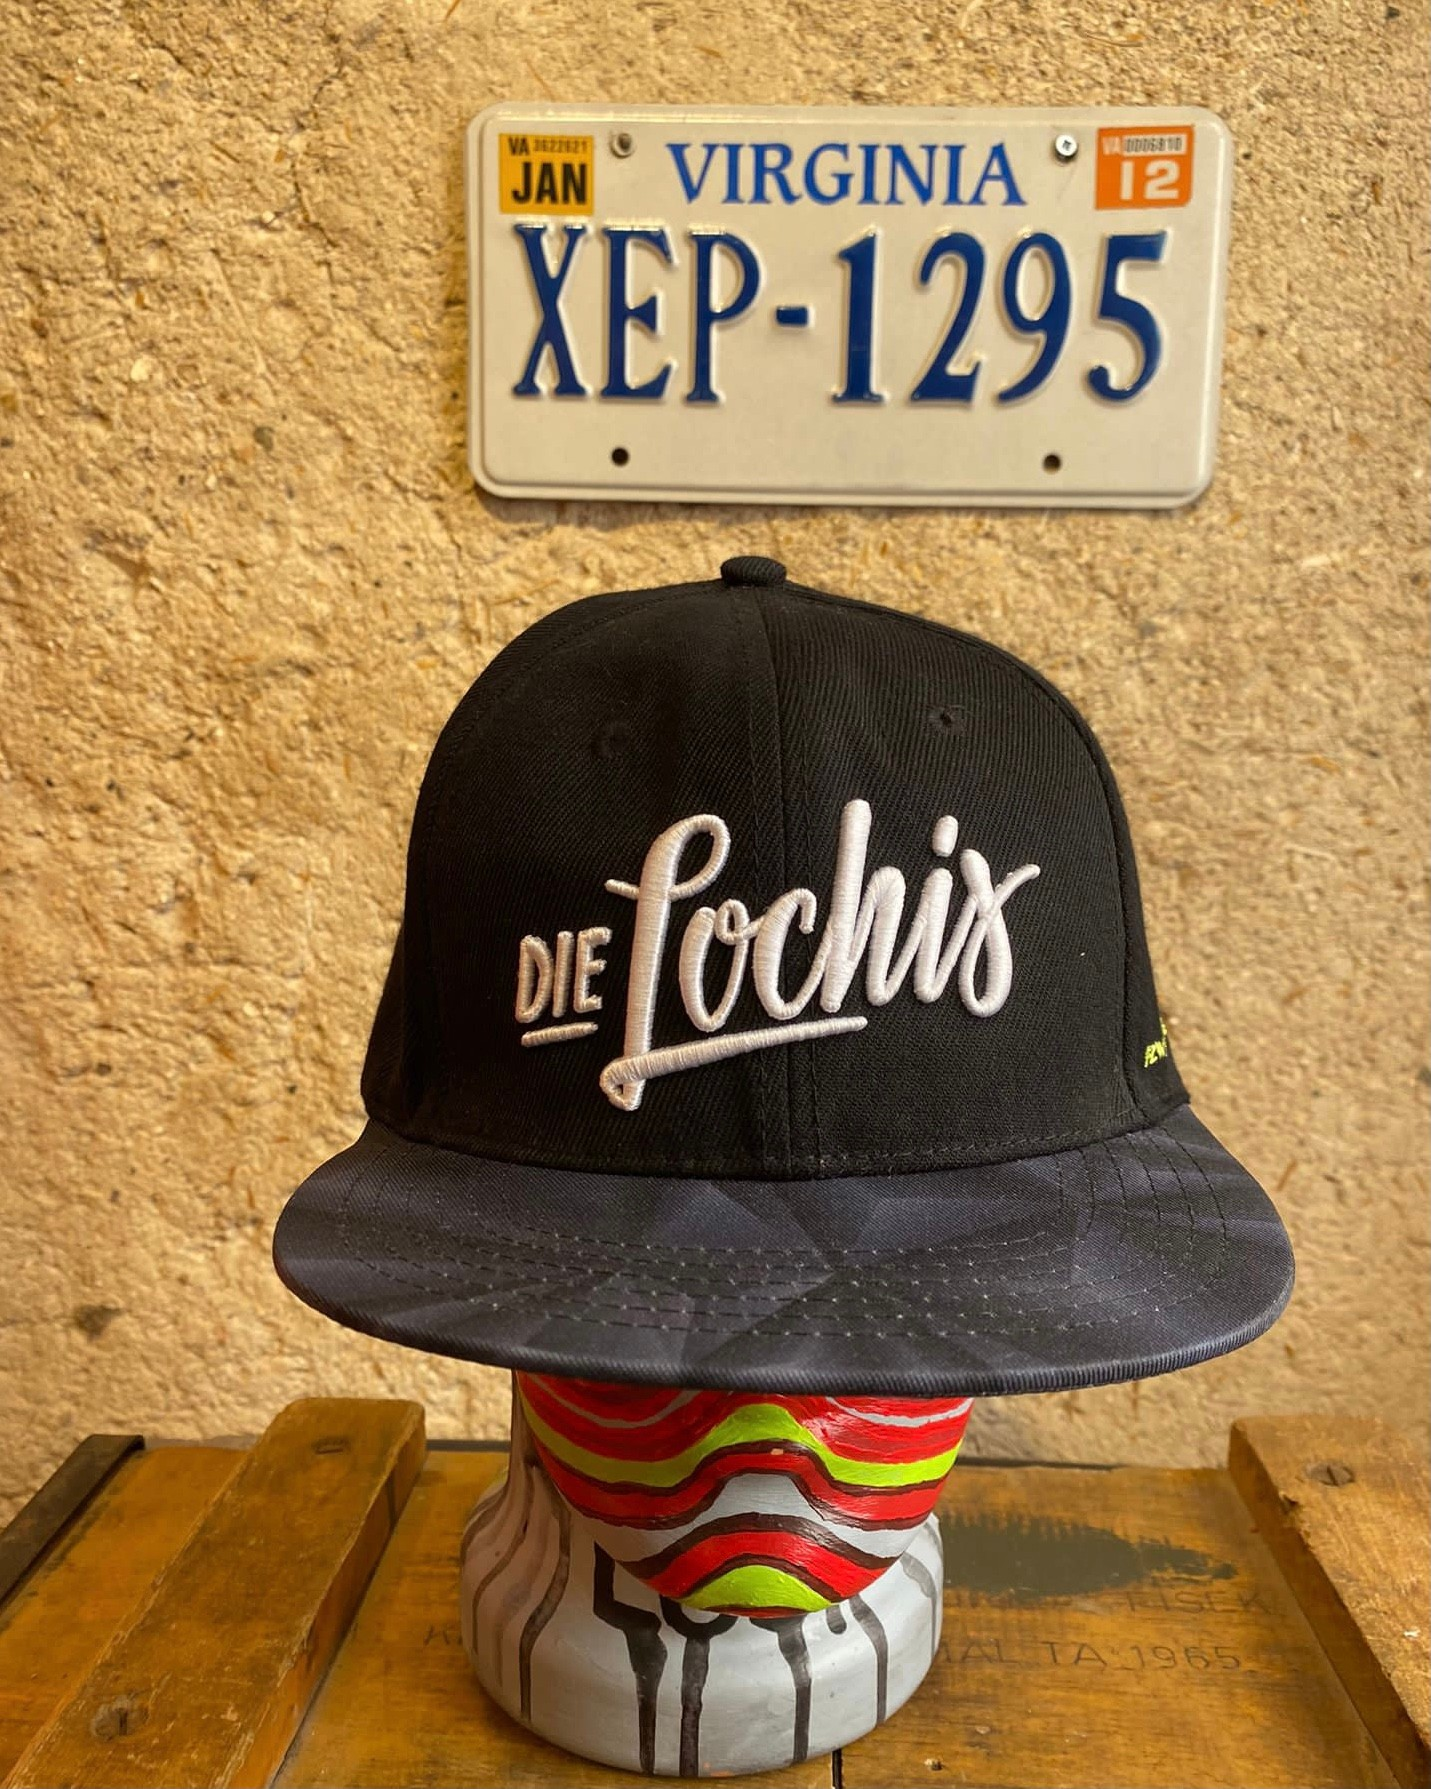 Die Lochis Cap